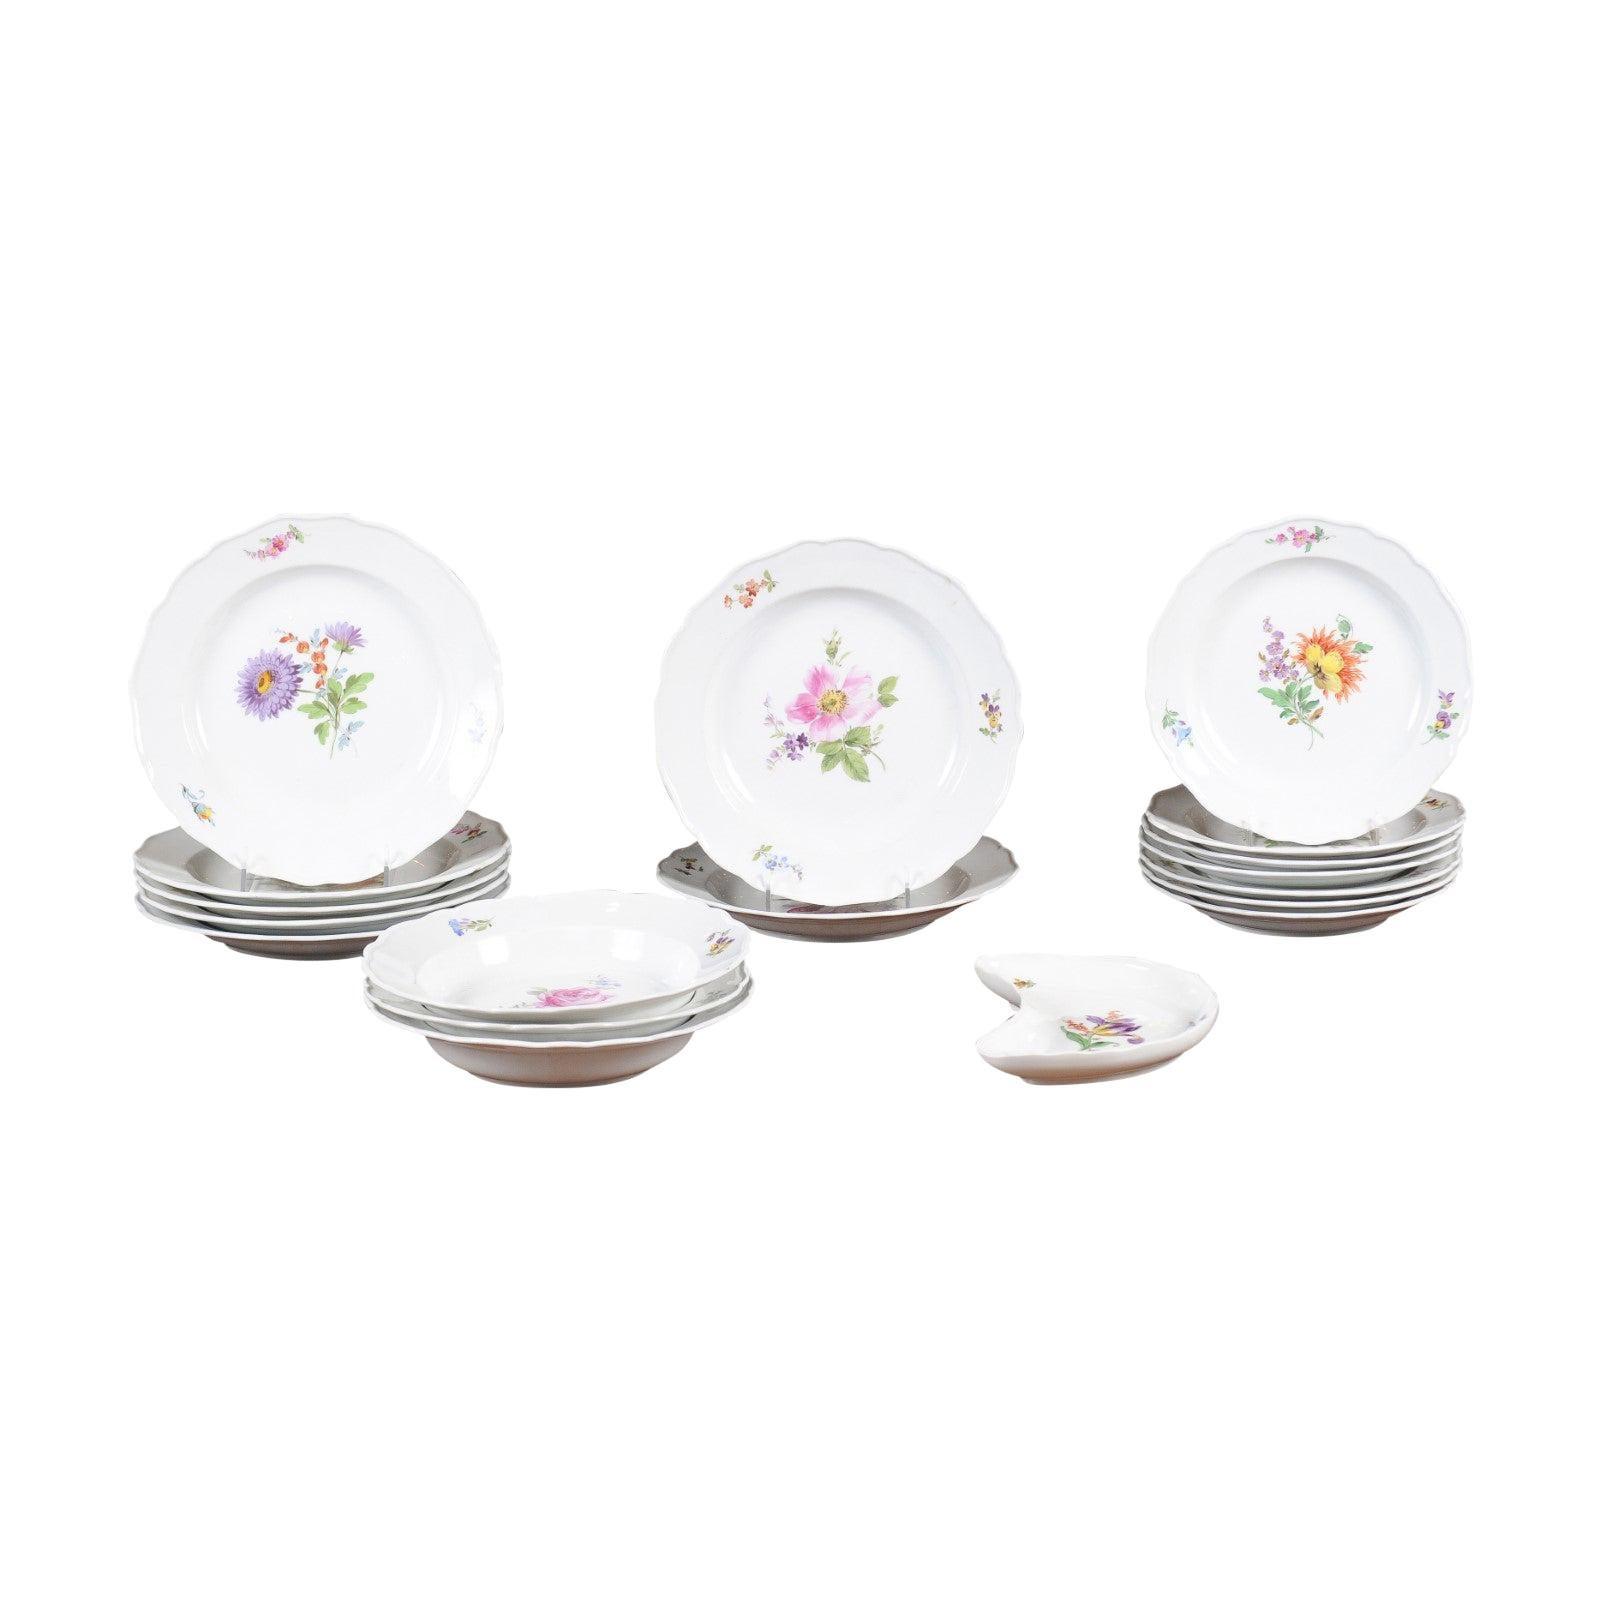 Set of 24 Pieces German Meissen Porcelain Dinner Service with Floral Decor